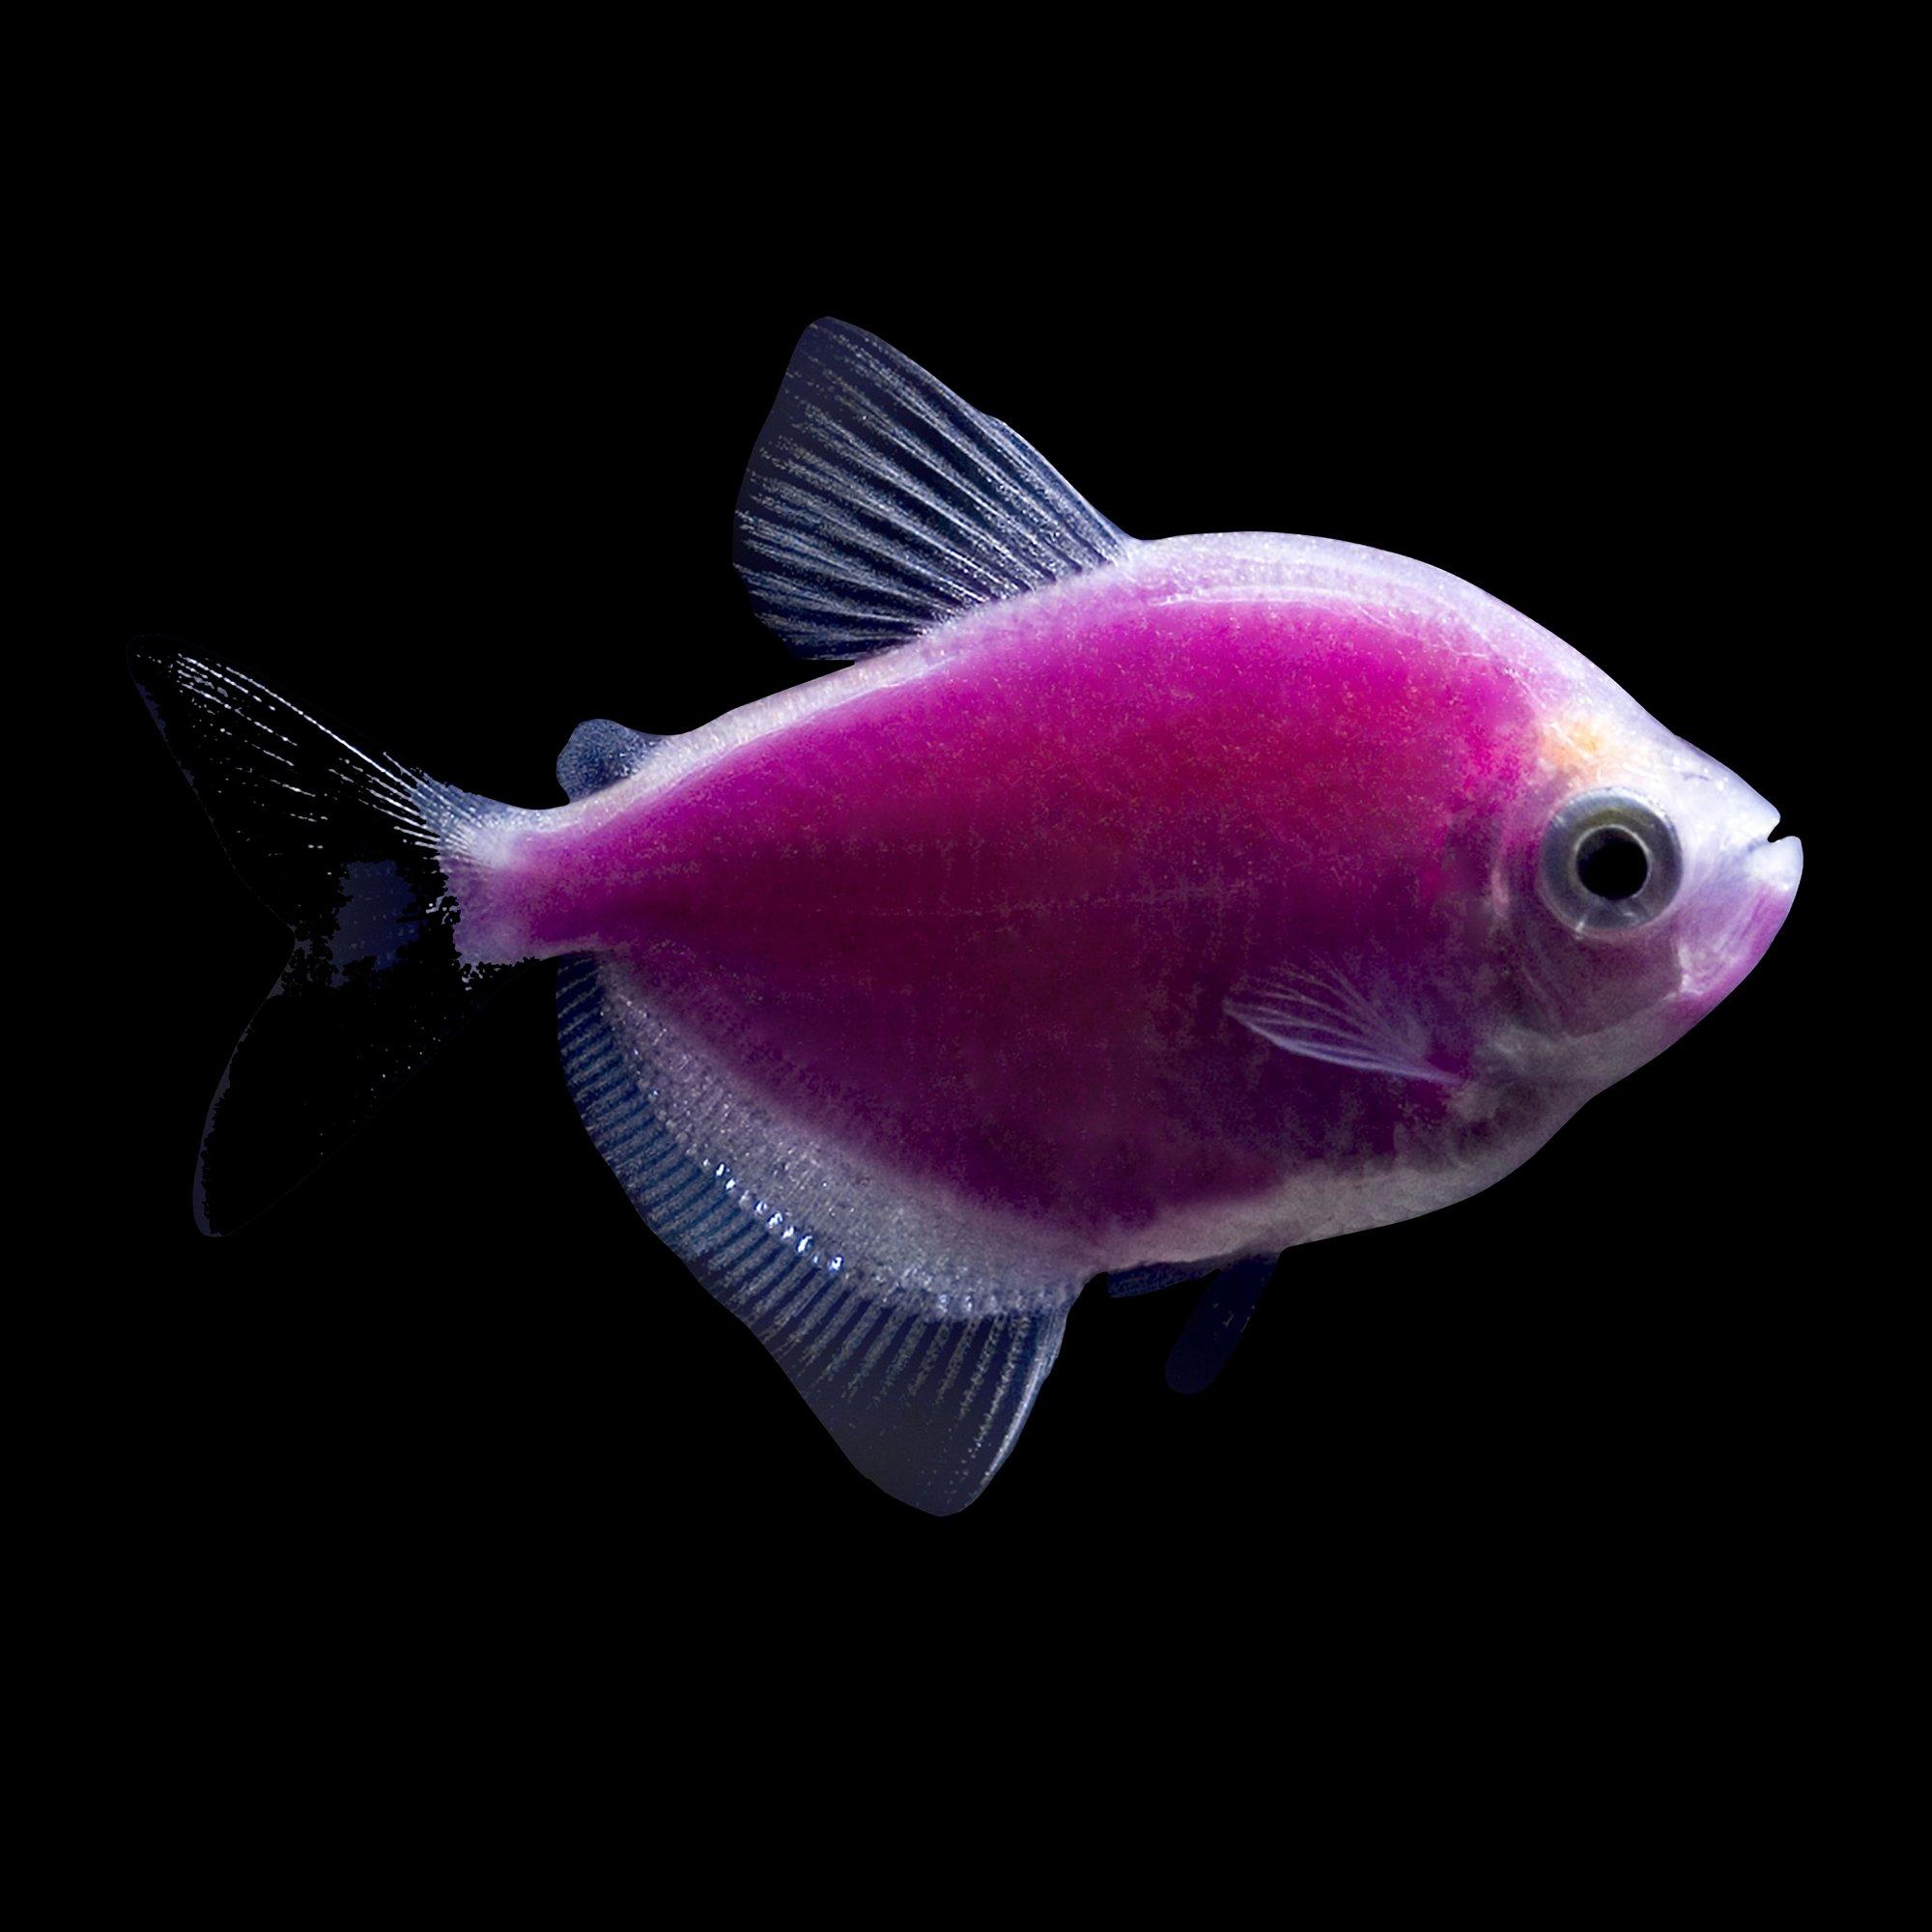 Glofish galactic purple tetra petco for Petco fish prices